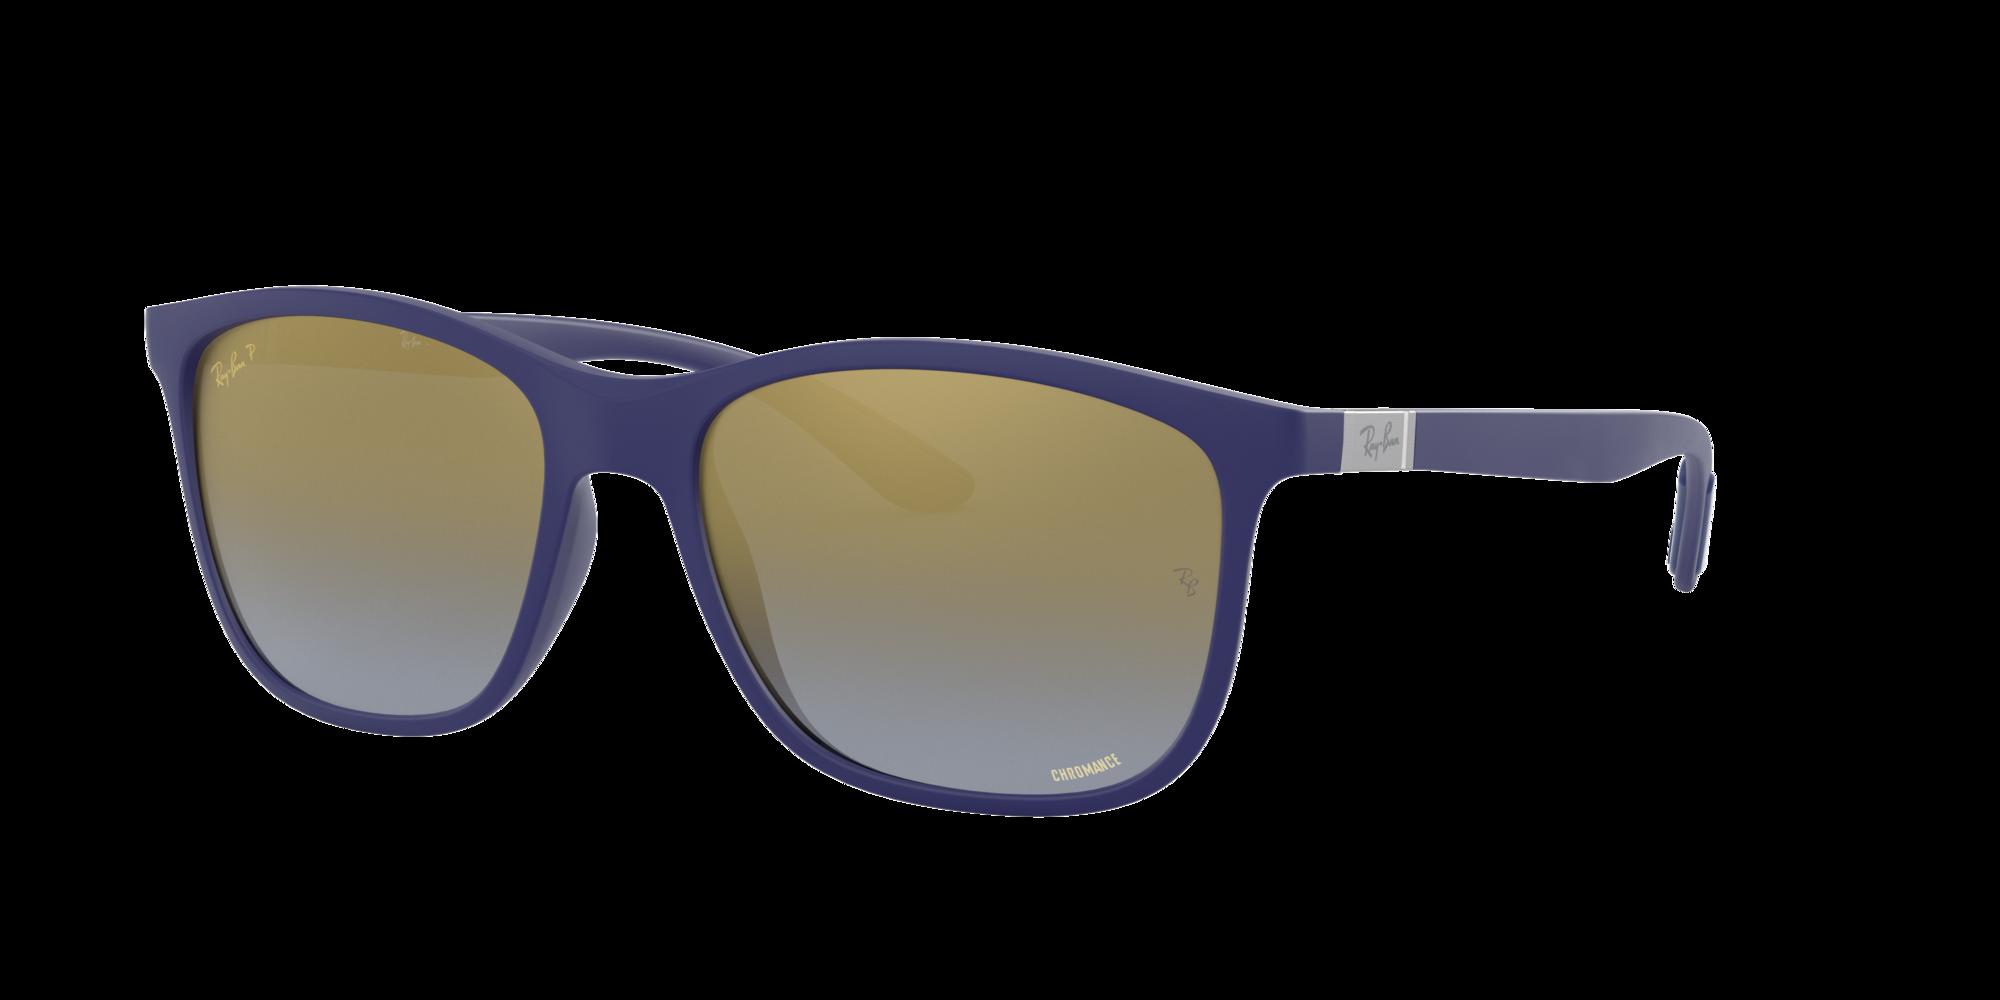 Ray Ban Unisex  RB4330 CHROMANCE -  Frame color: Azul, Lens color: Espejadas azul, Size 56-17/145